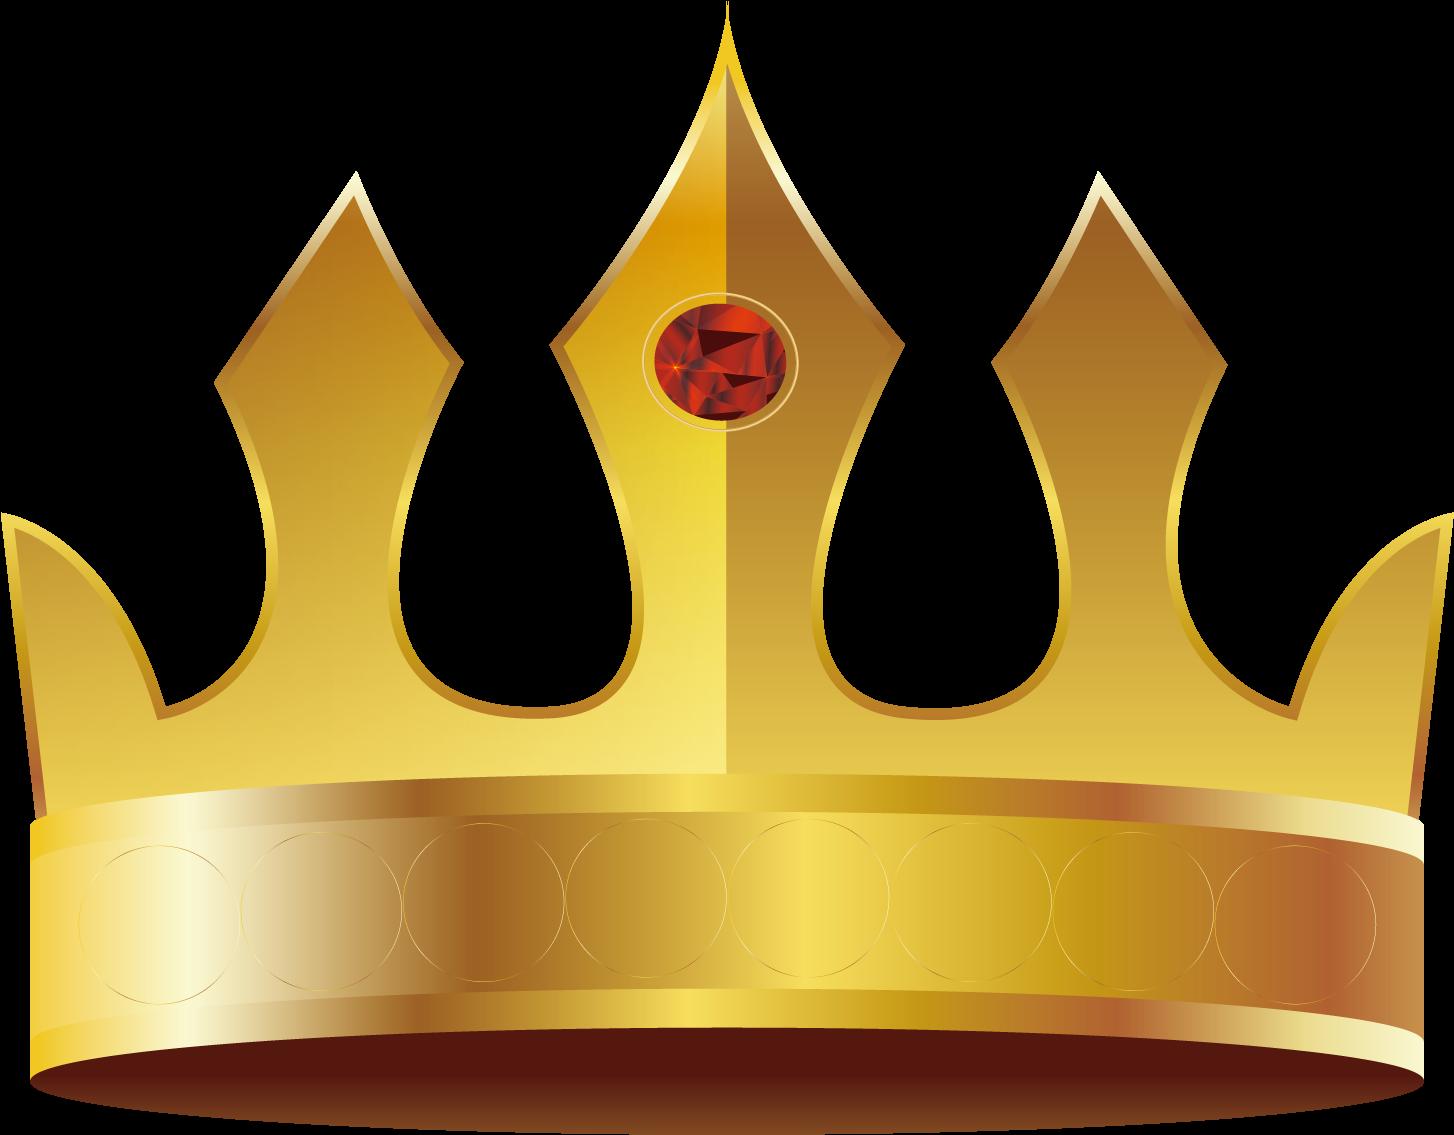 больше вектор картинки корона немецких нацистских